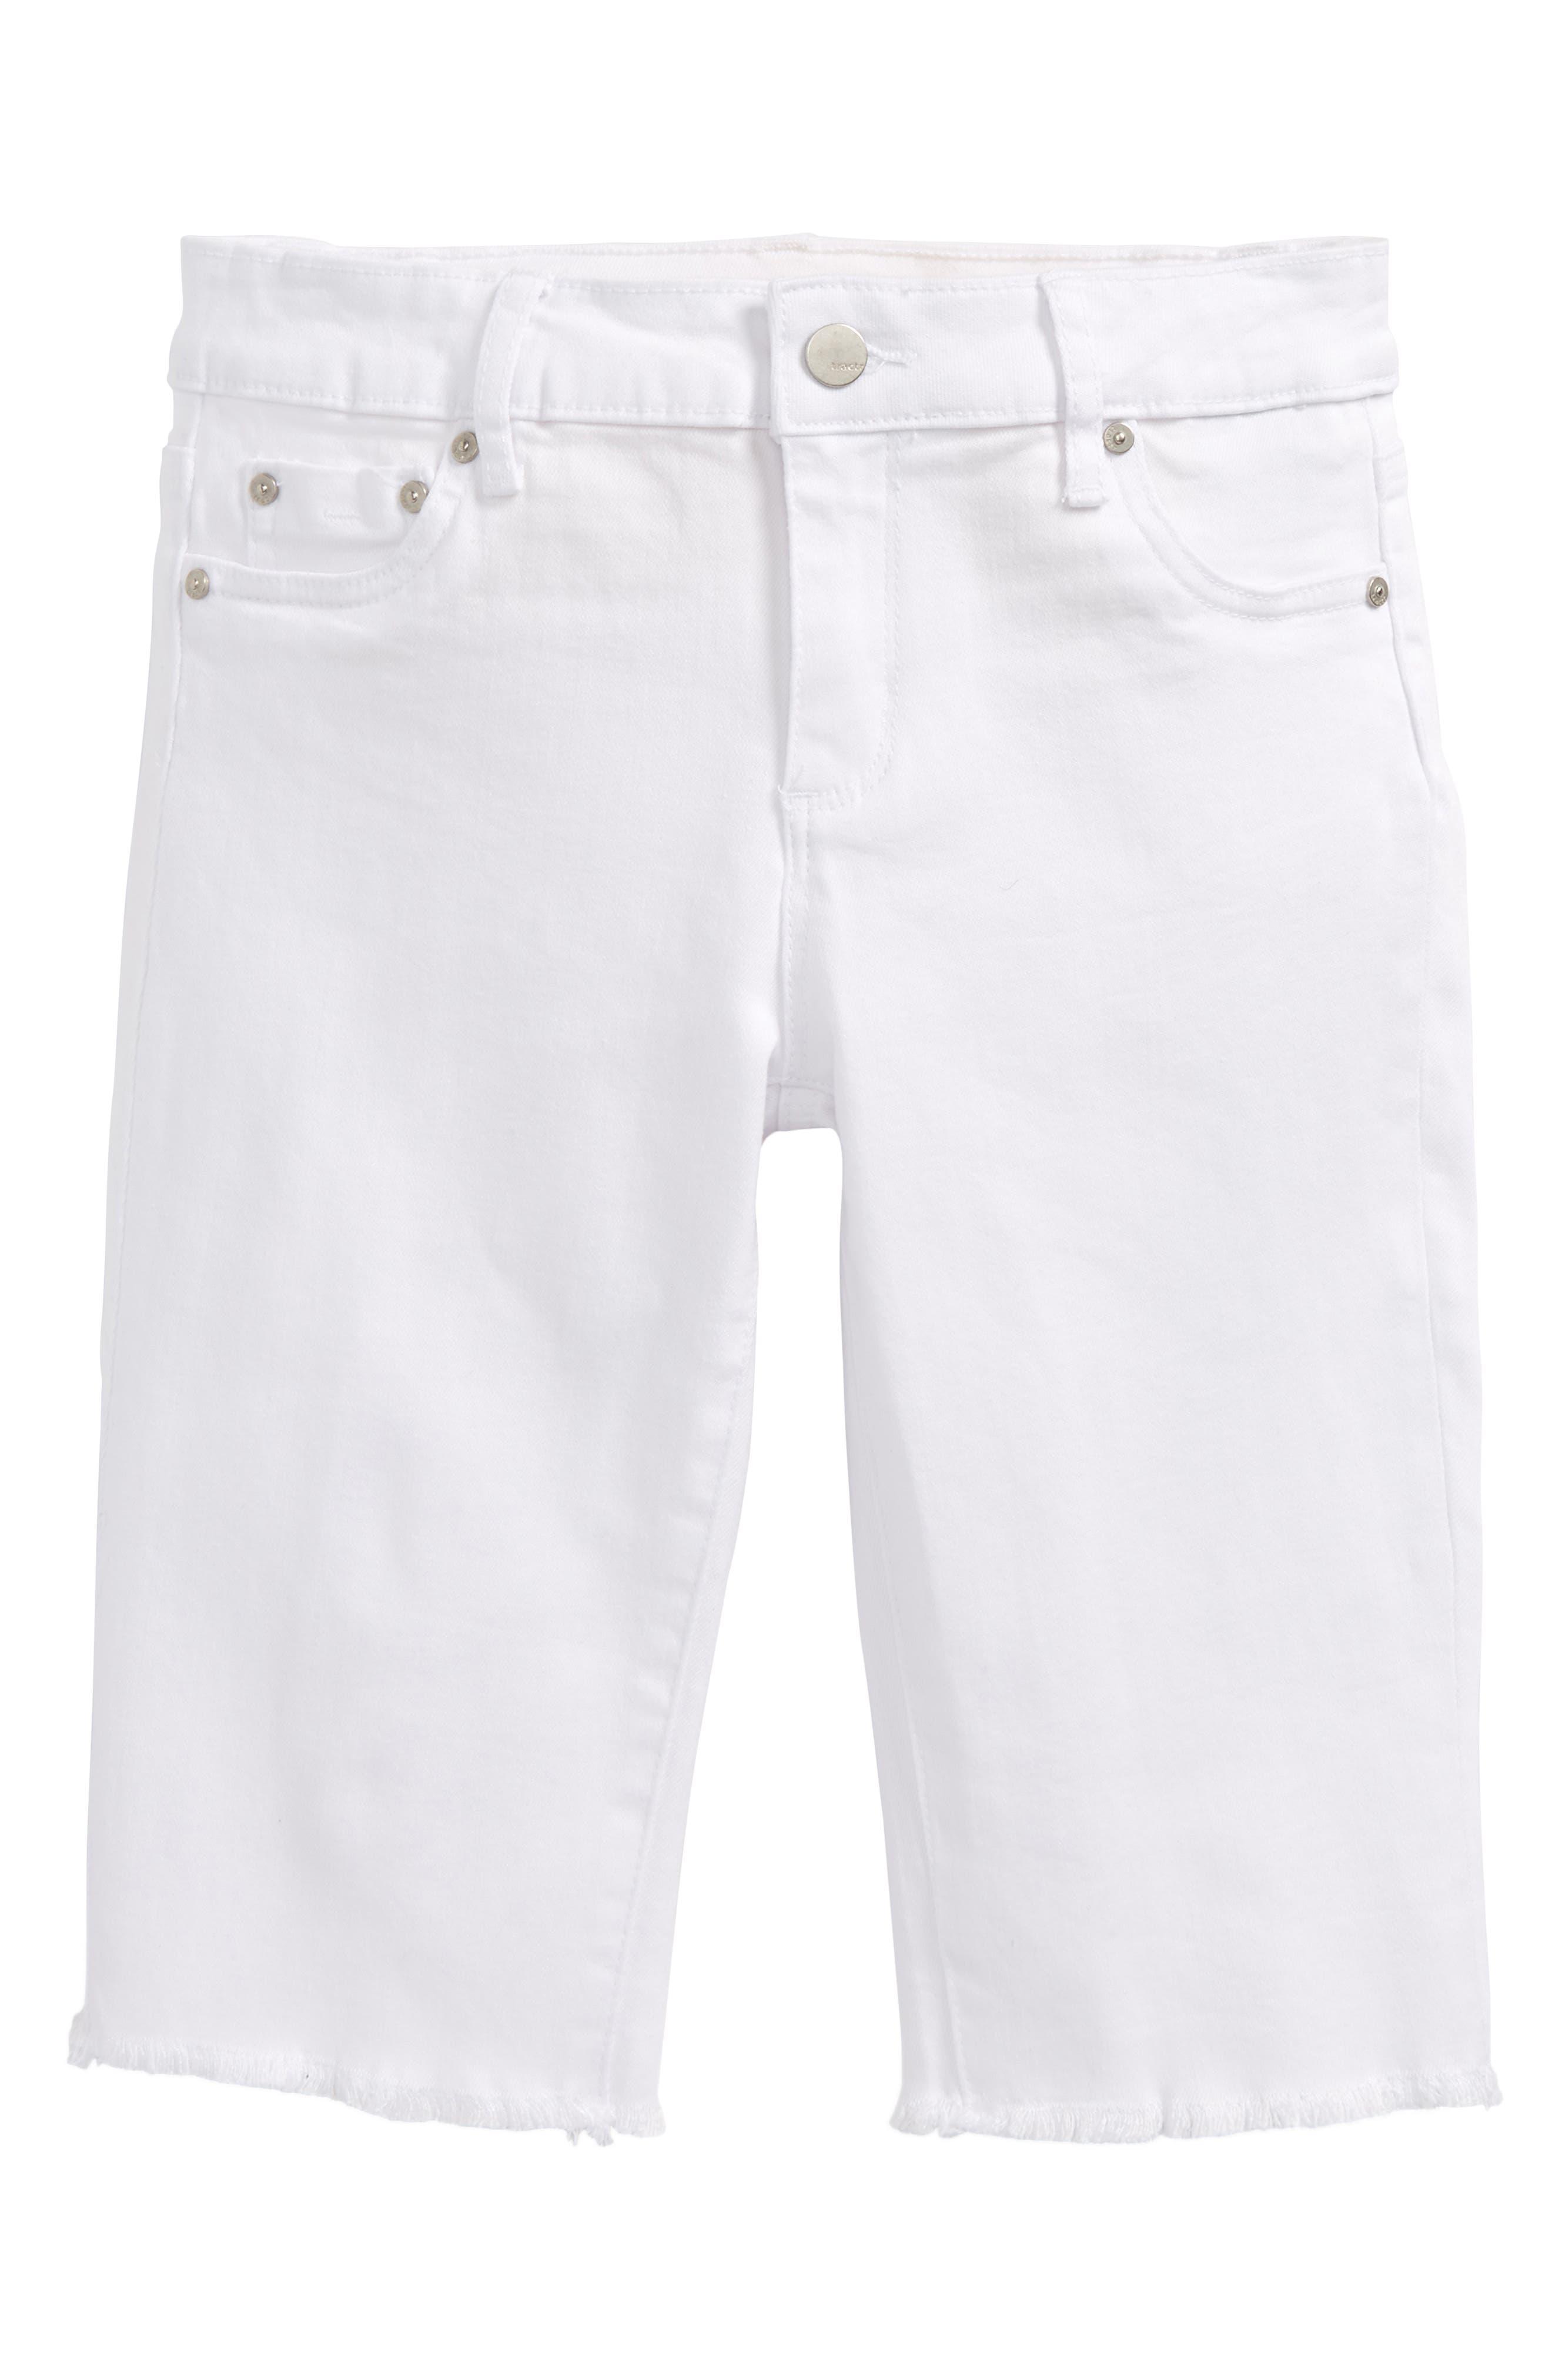 Main Image - Tractr Frayed Hem Bermuda Shorts (Big Girls)